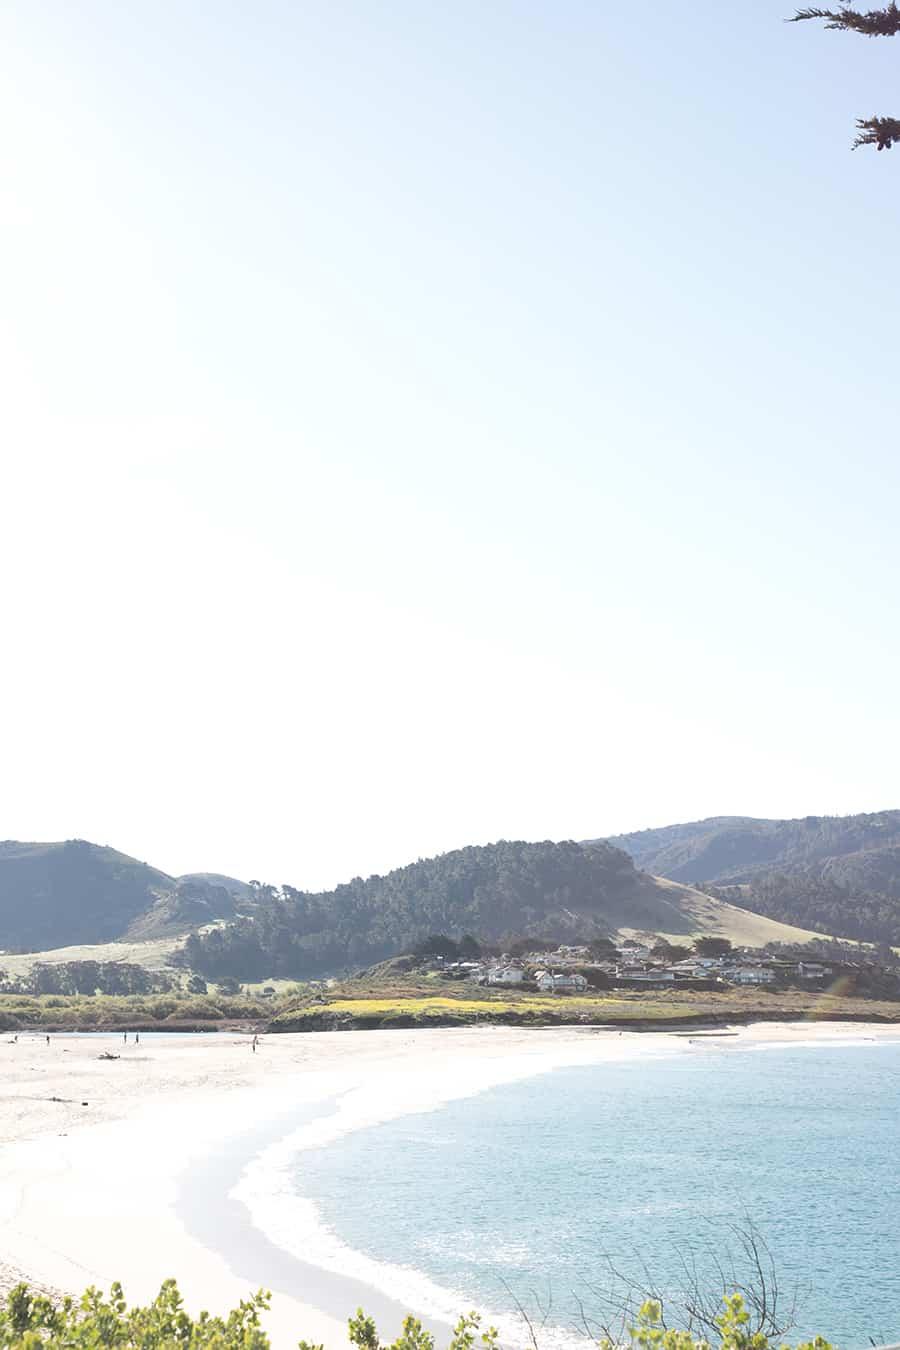 Beach with mountains in Carmel California